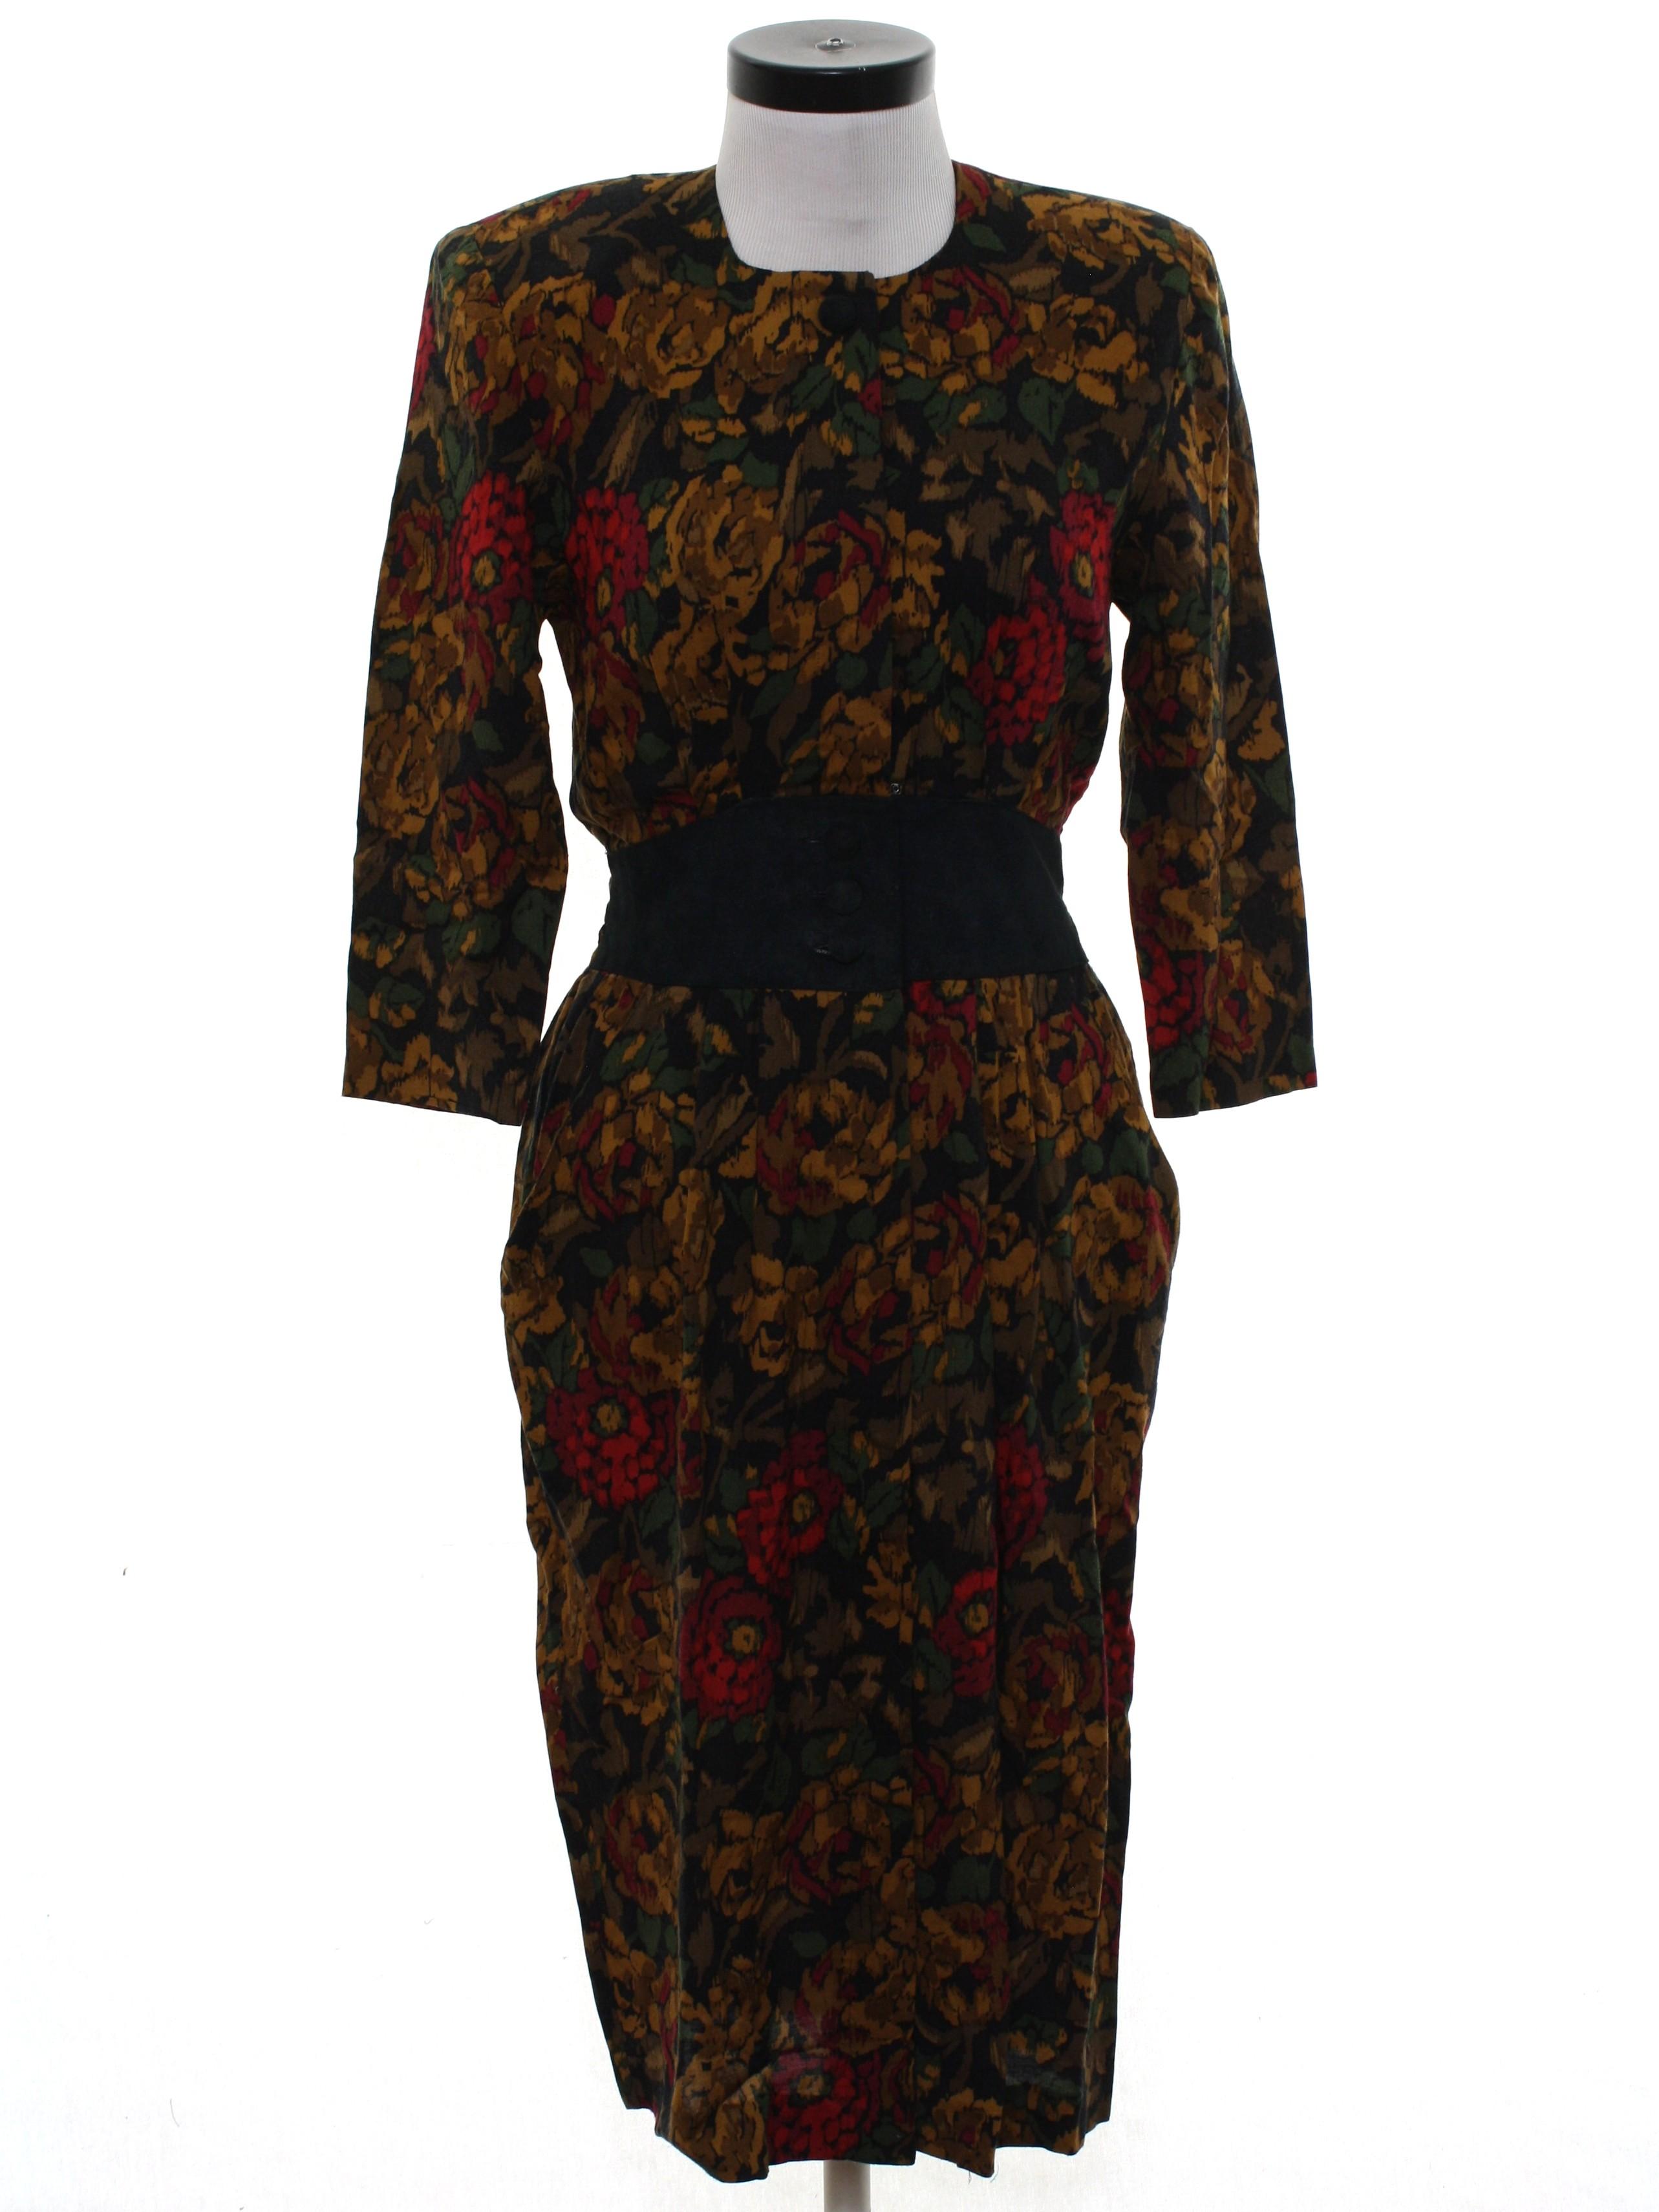 7a4f93c13c1c Karin Stevens 80 s Vintage Dress  80s -Karin Stevens- Womens black  background rayon short sleeve mid length totally 80s secretary dress.